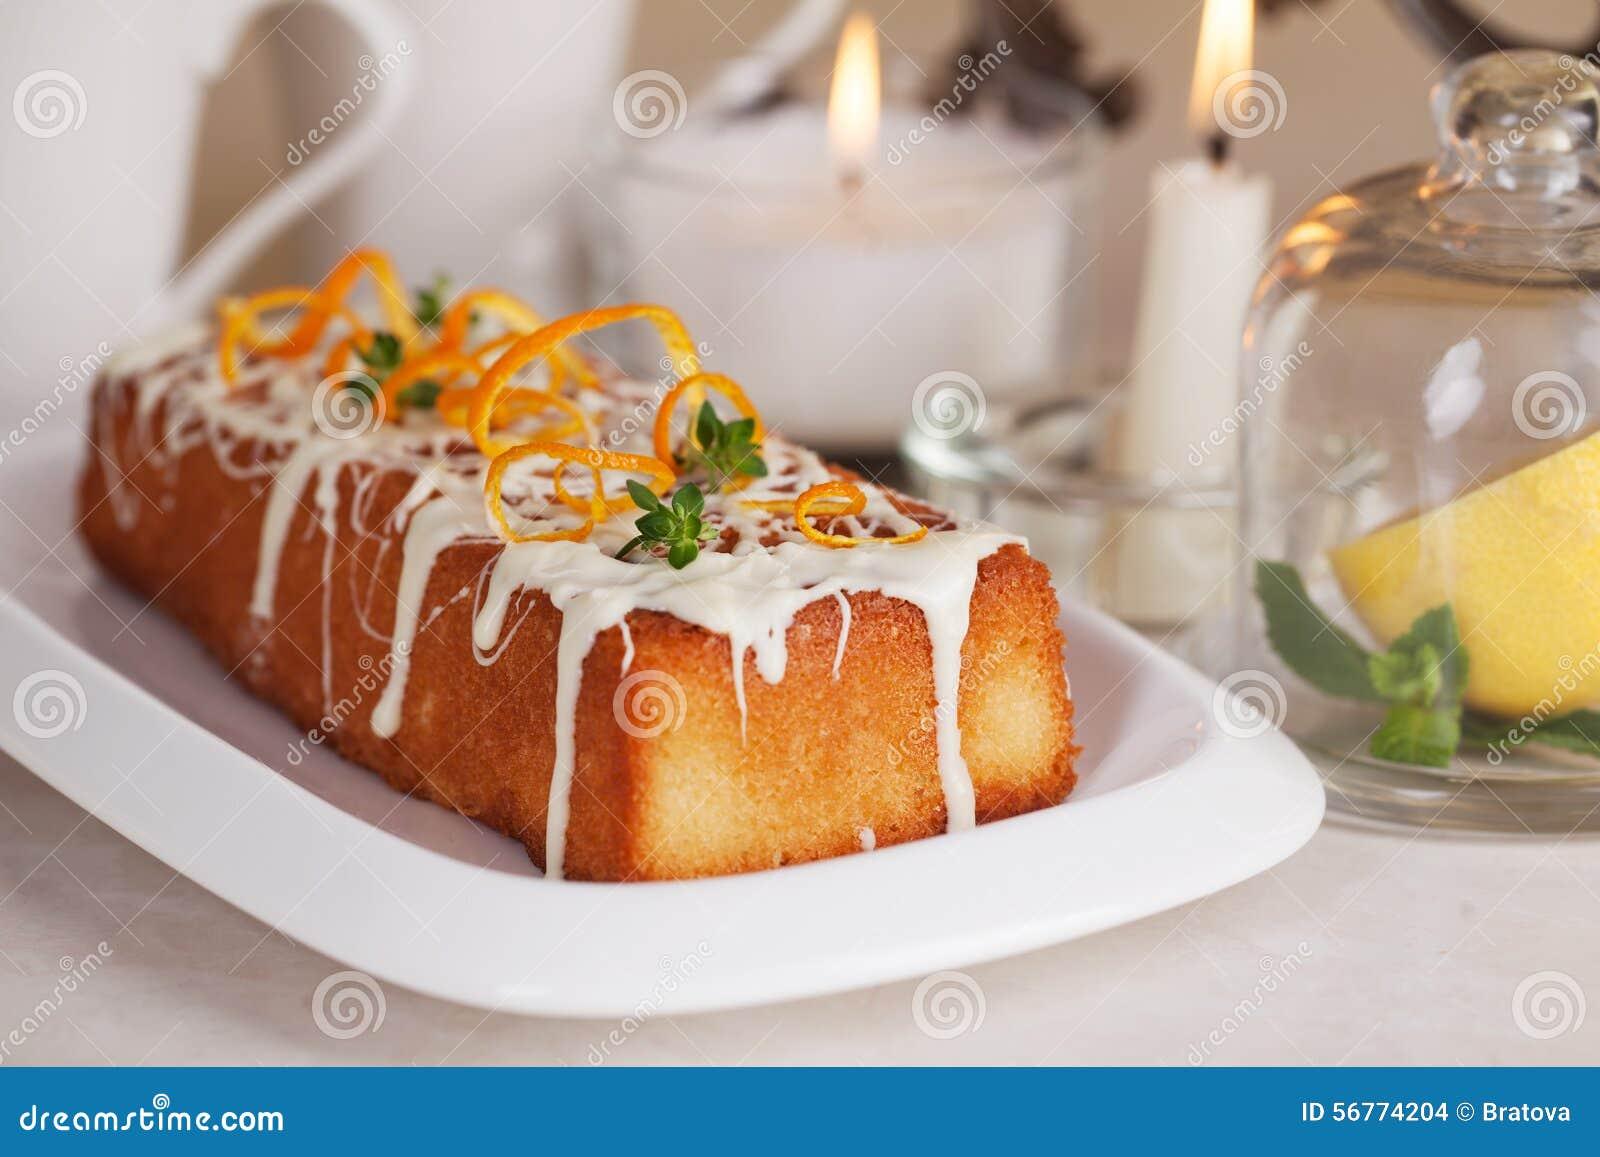 Orange And White Chocolate Loaf Cake